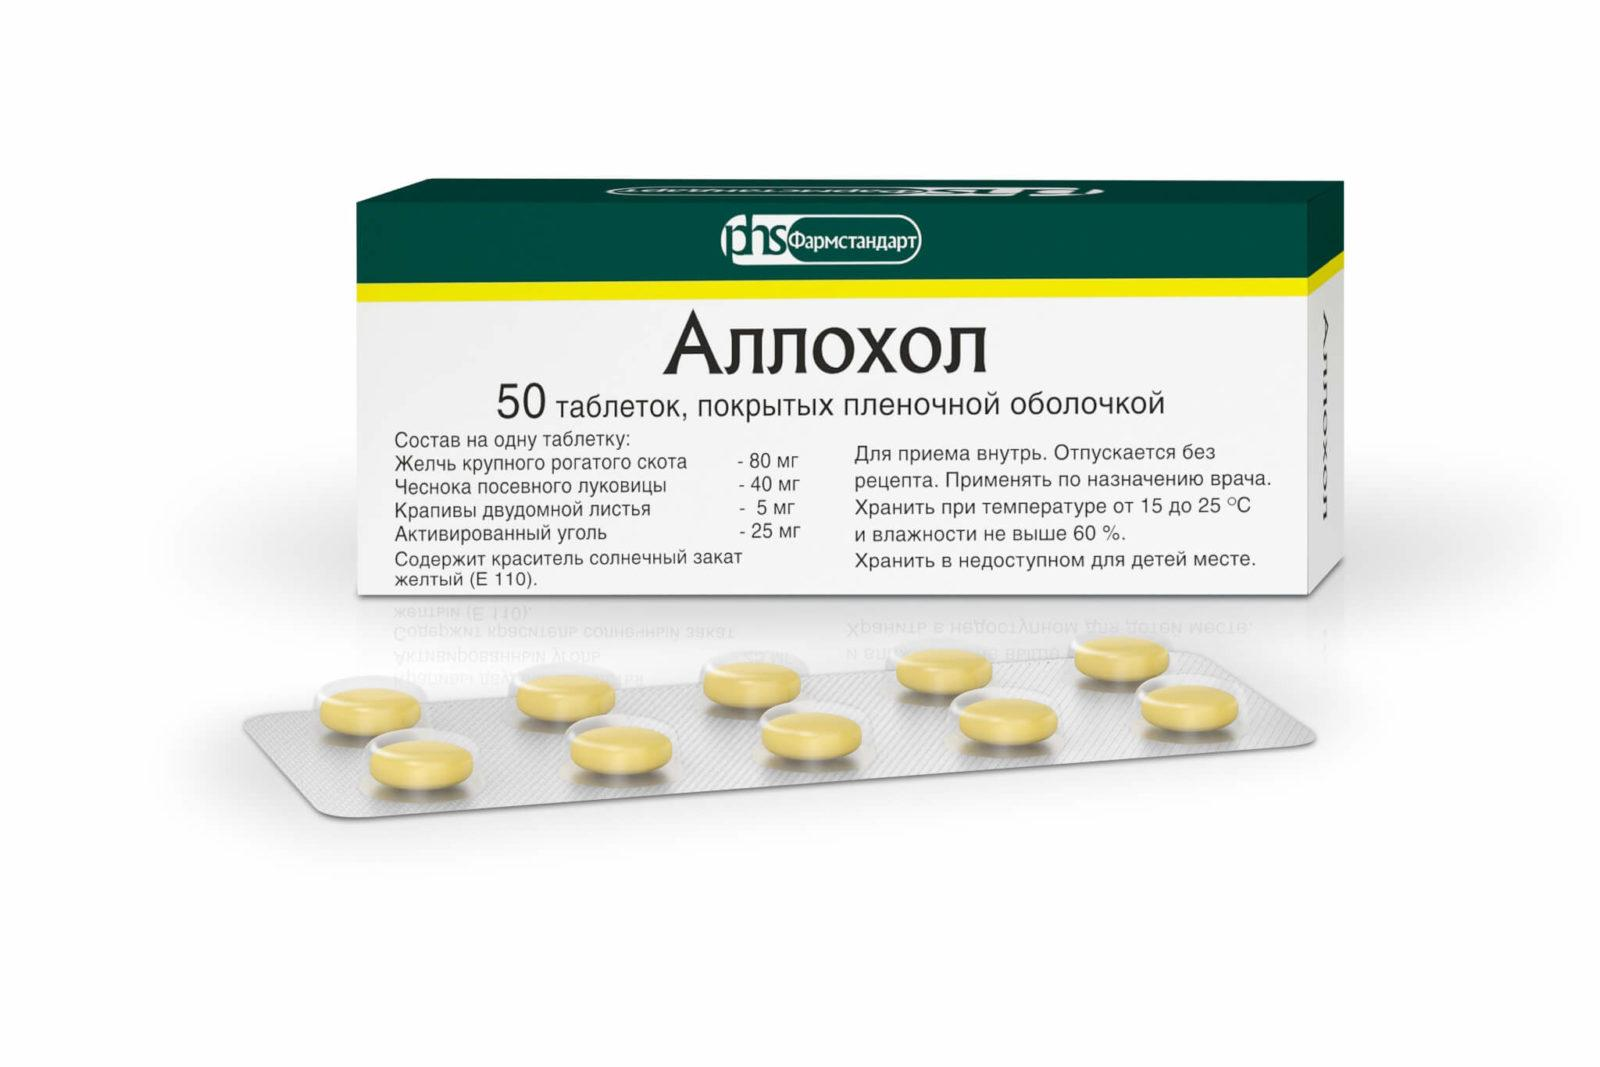 Фото препарата Аллохол таблетки покрытые оболочкой банка